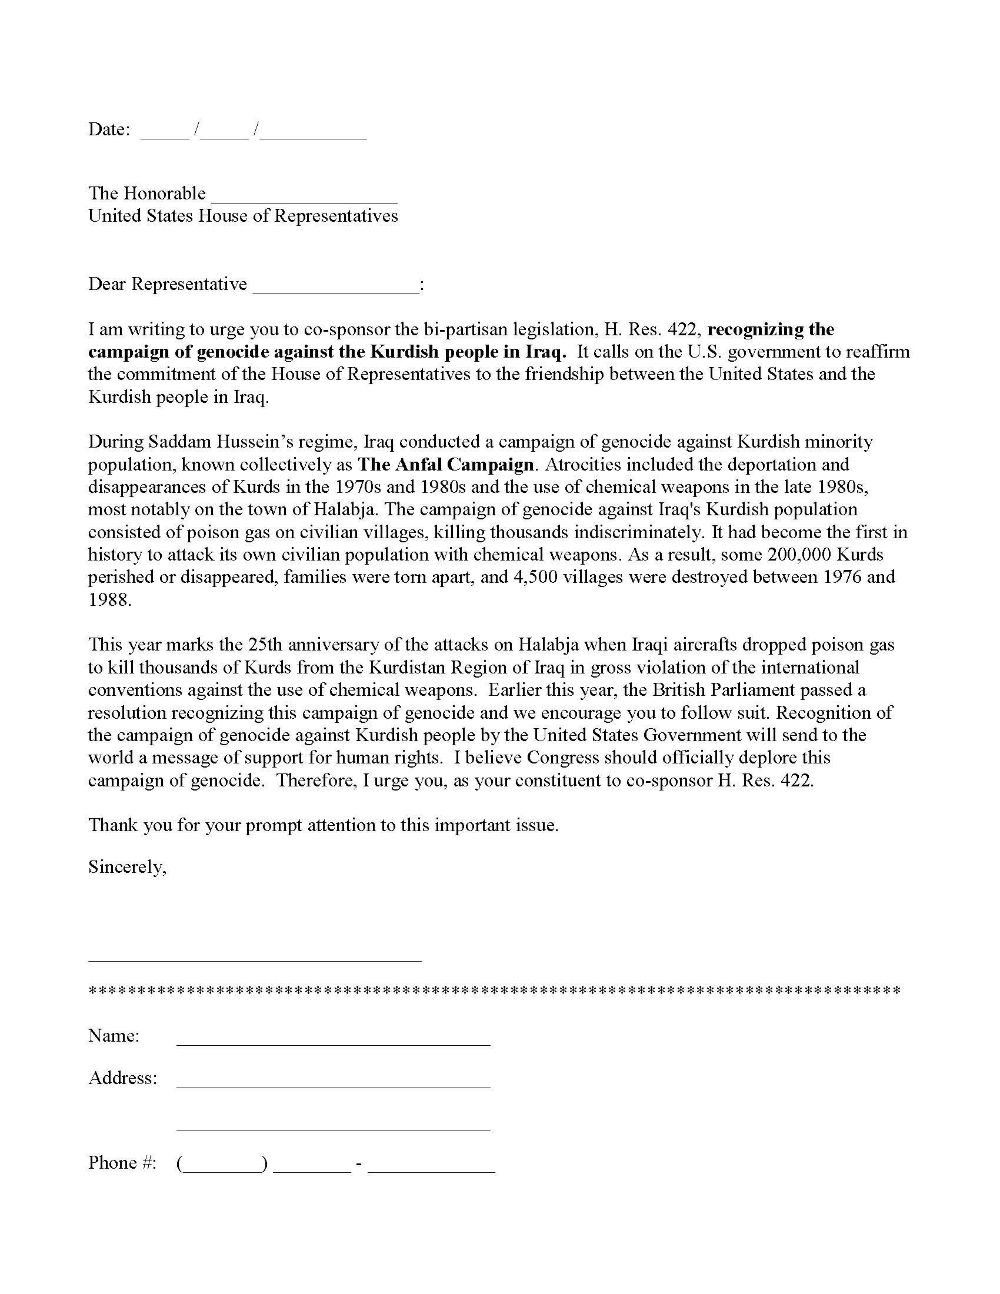 Writing A Letter To A Senator Template - slide share